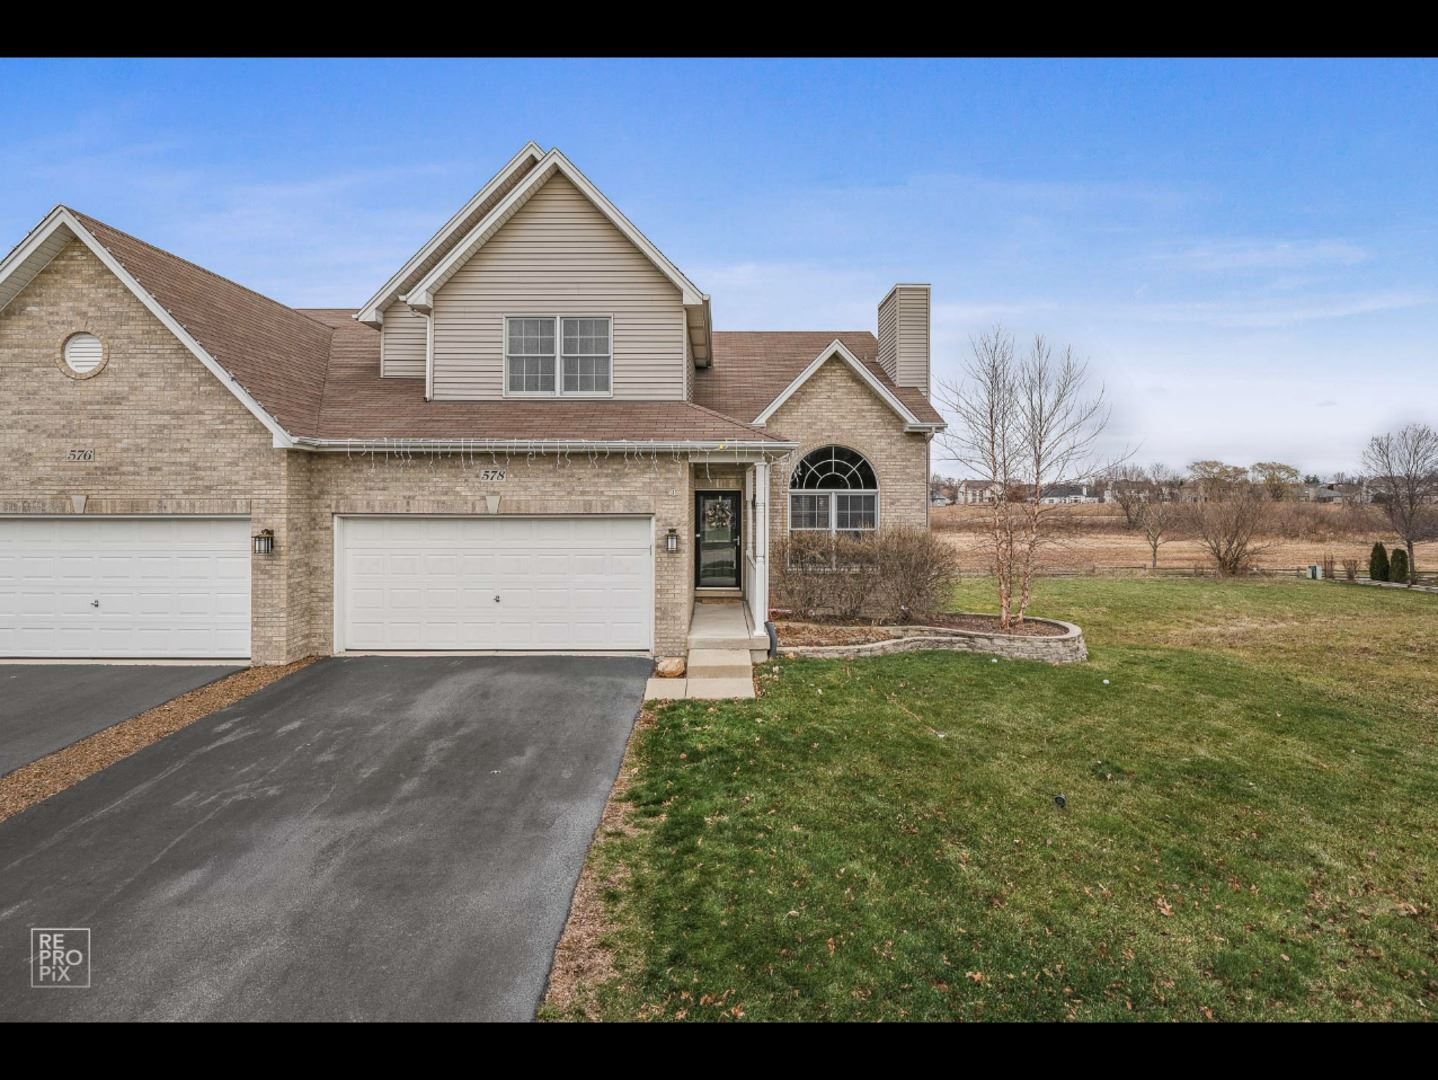 Photo of 578 Sudbury Circle, Oswego, IL 60543 (MLS # 10945954)